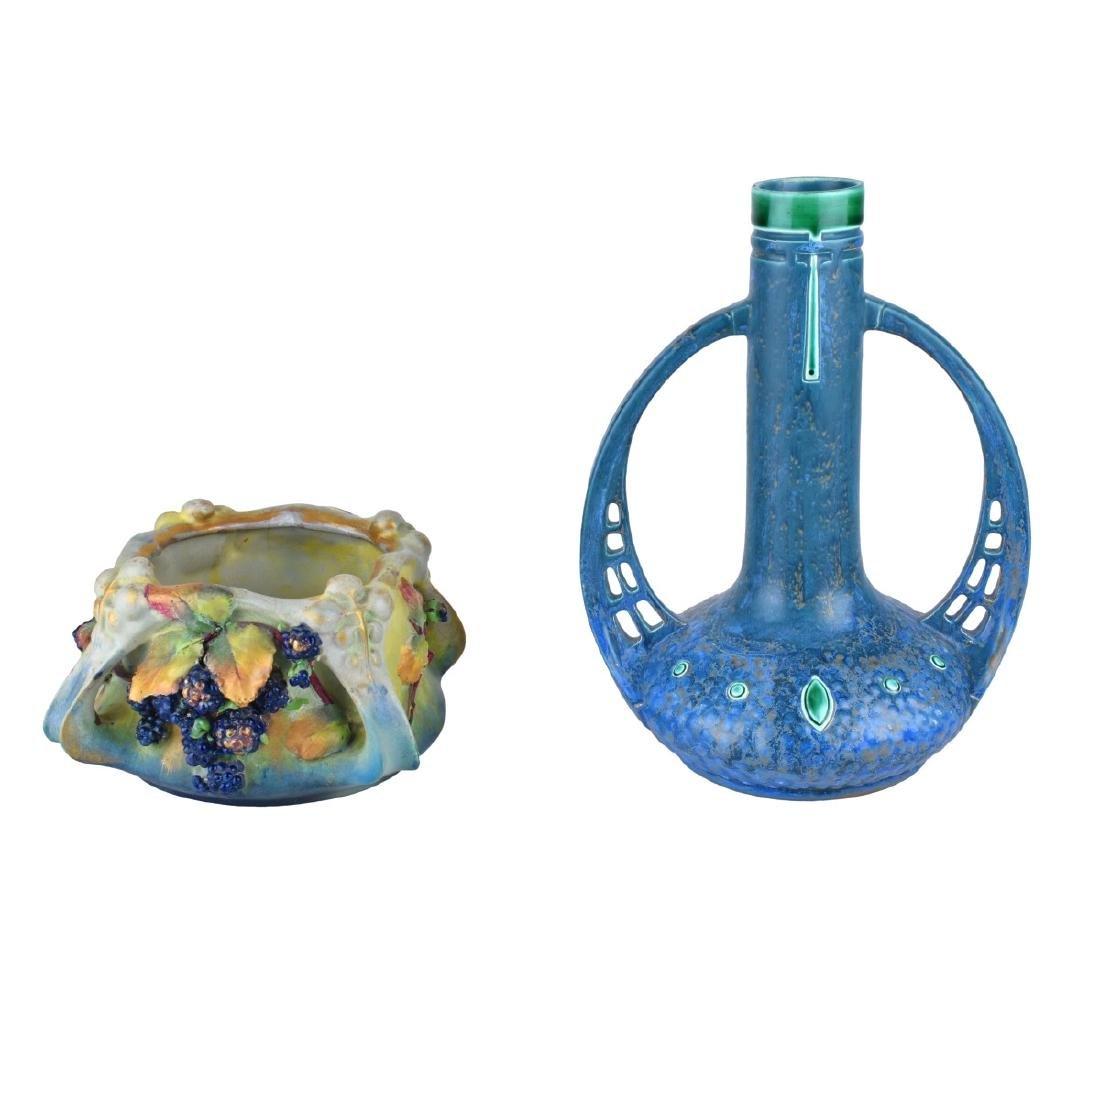 Amphora Two (2) Piece Lot